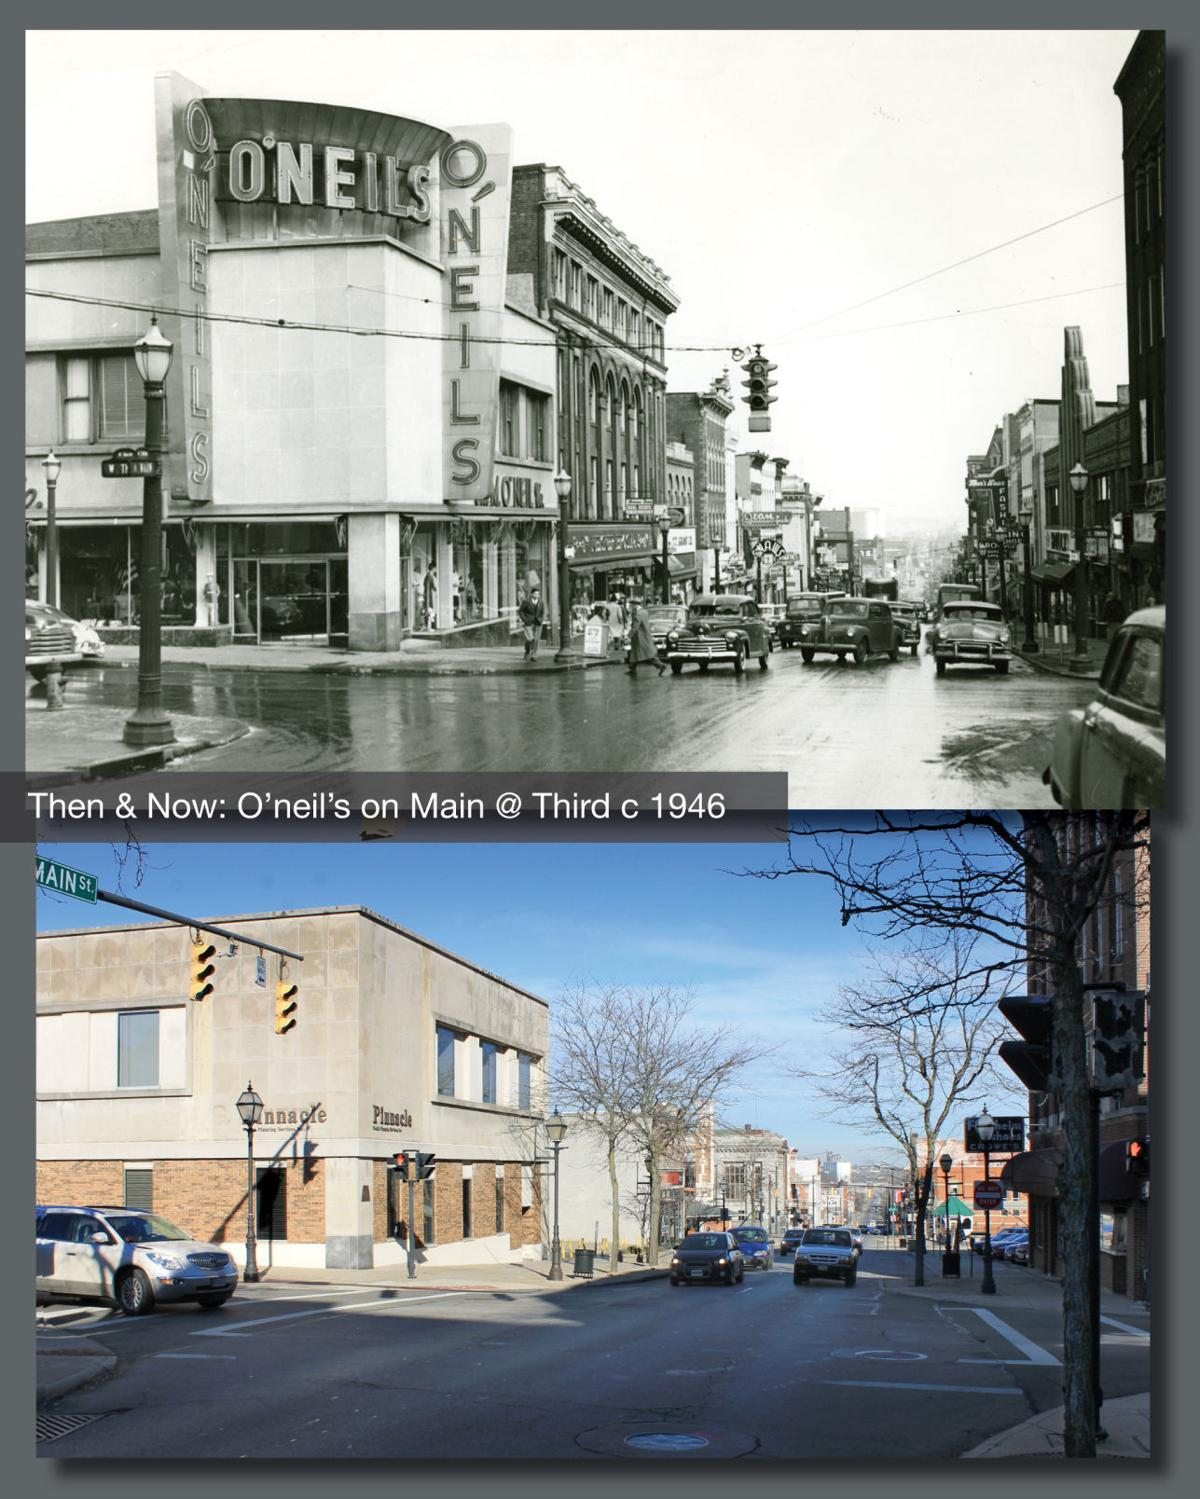 Then & Now: O'neil's Main & Third